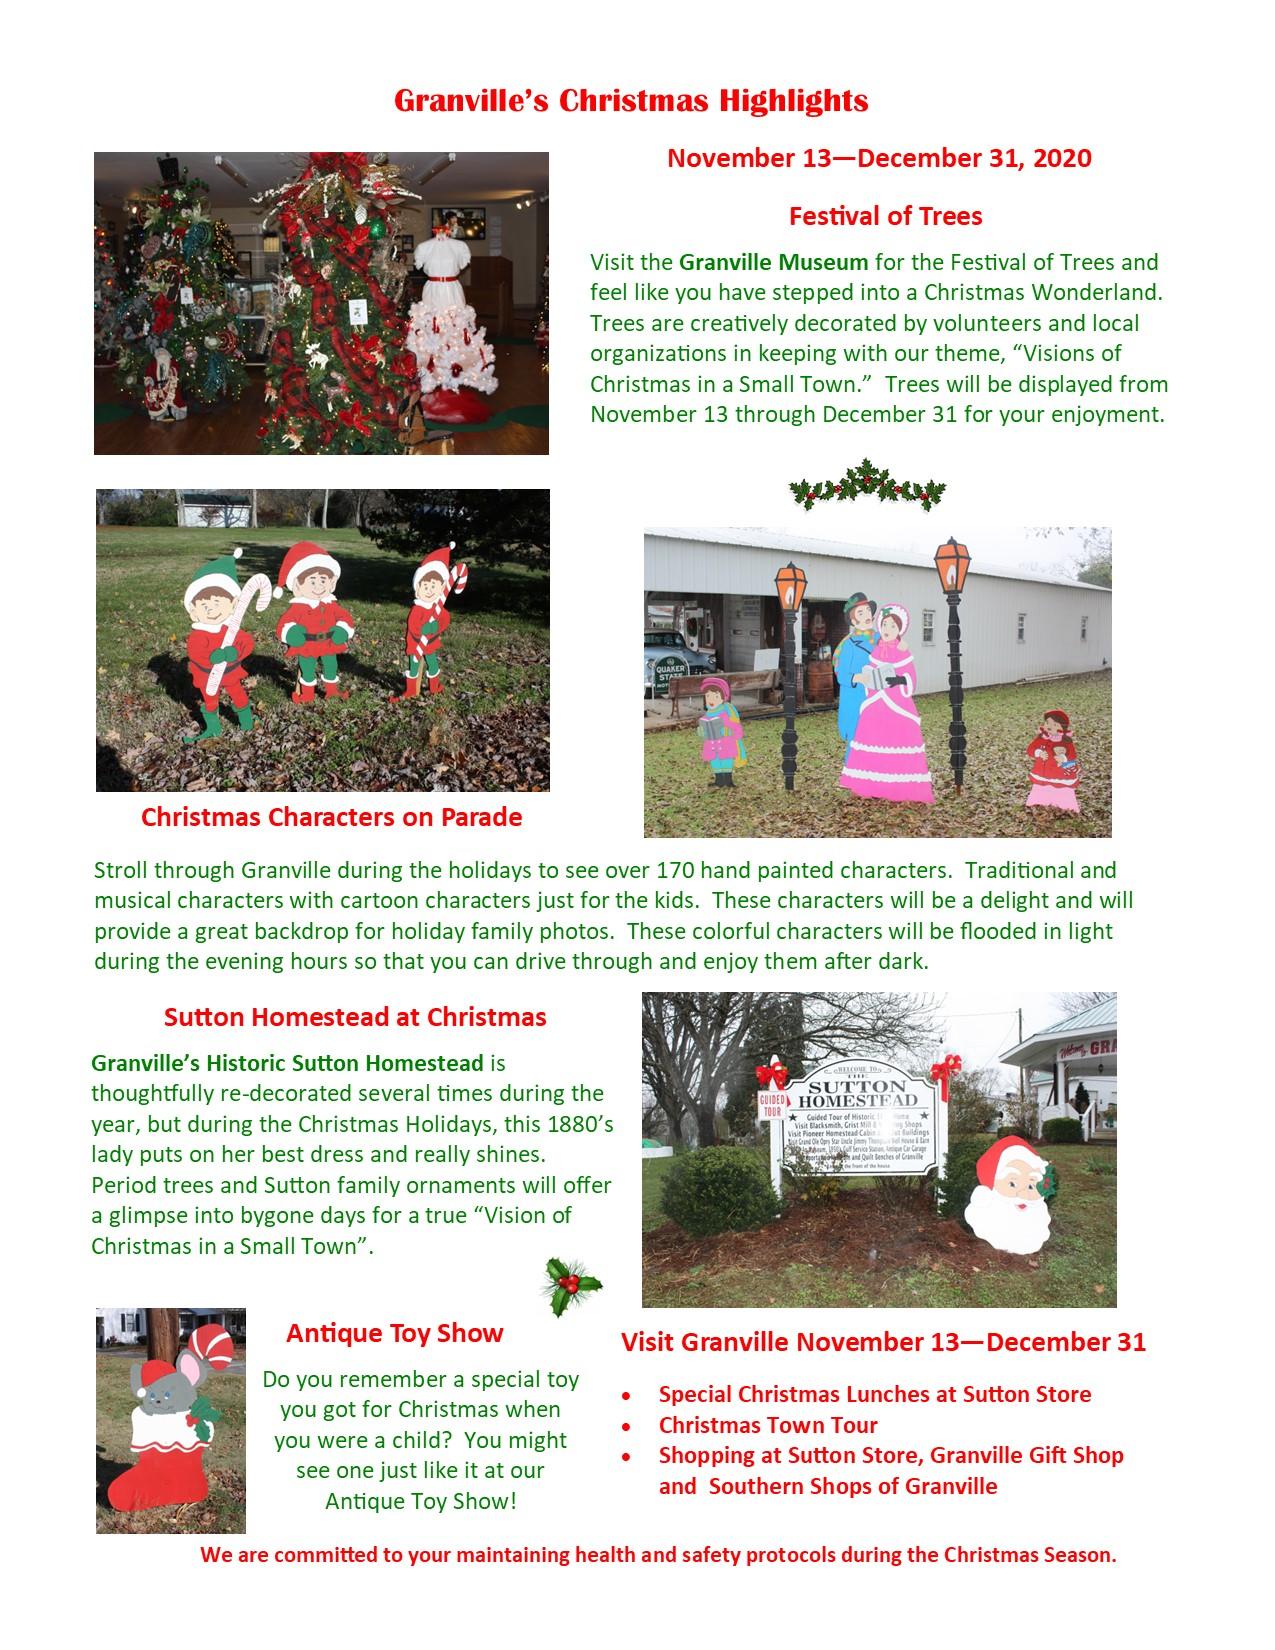 Sutton Christmas Parade 2020 CHRISTMAS HIGHLIGHTS 2020 | Granville, TN